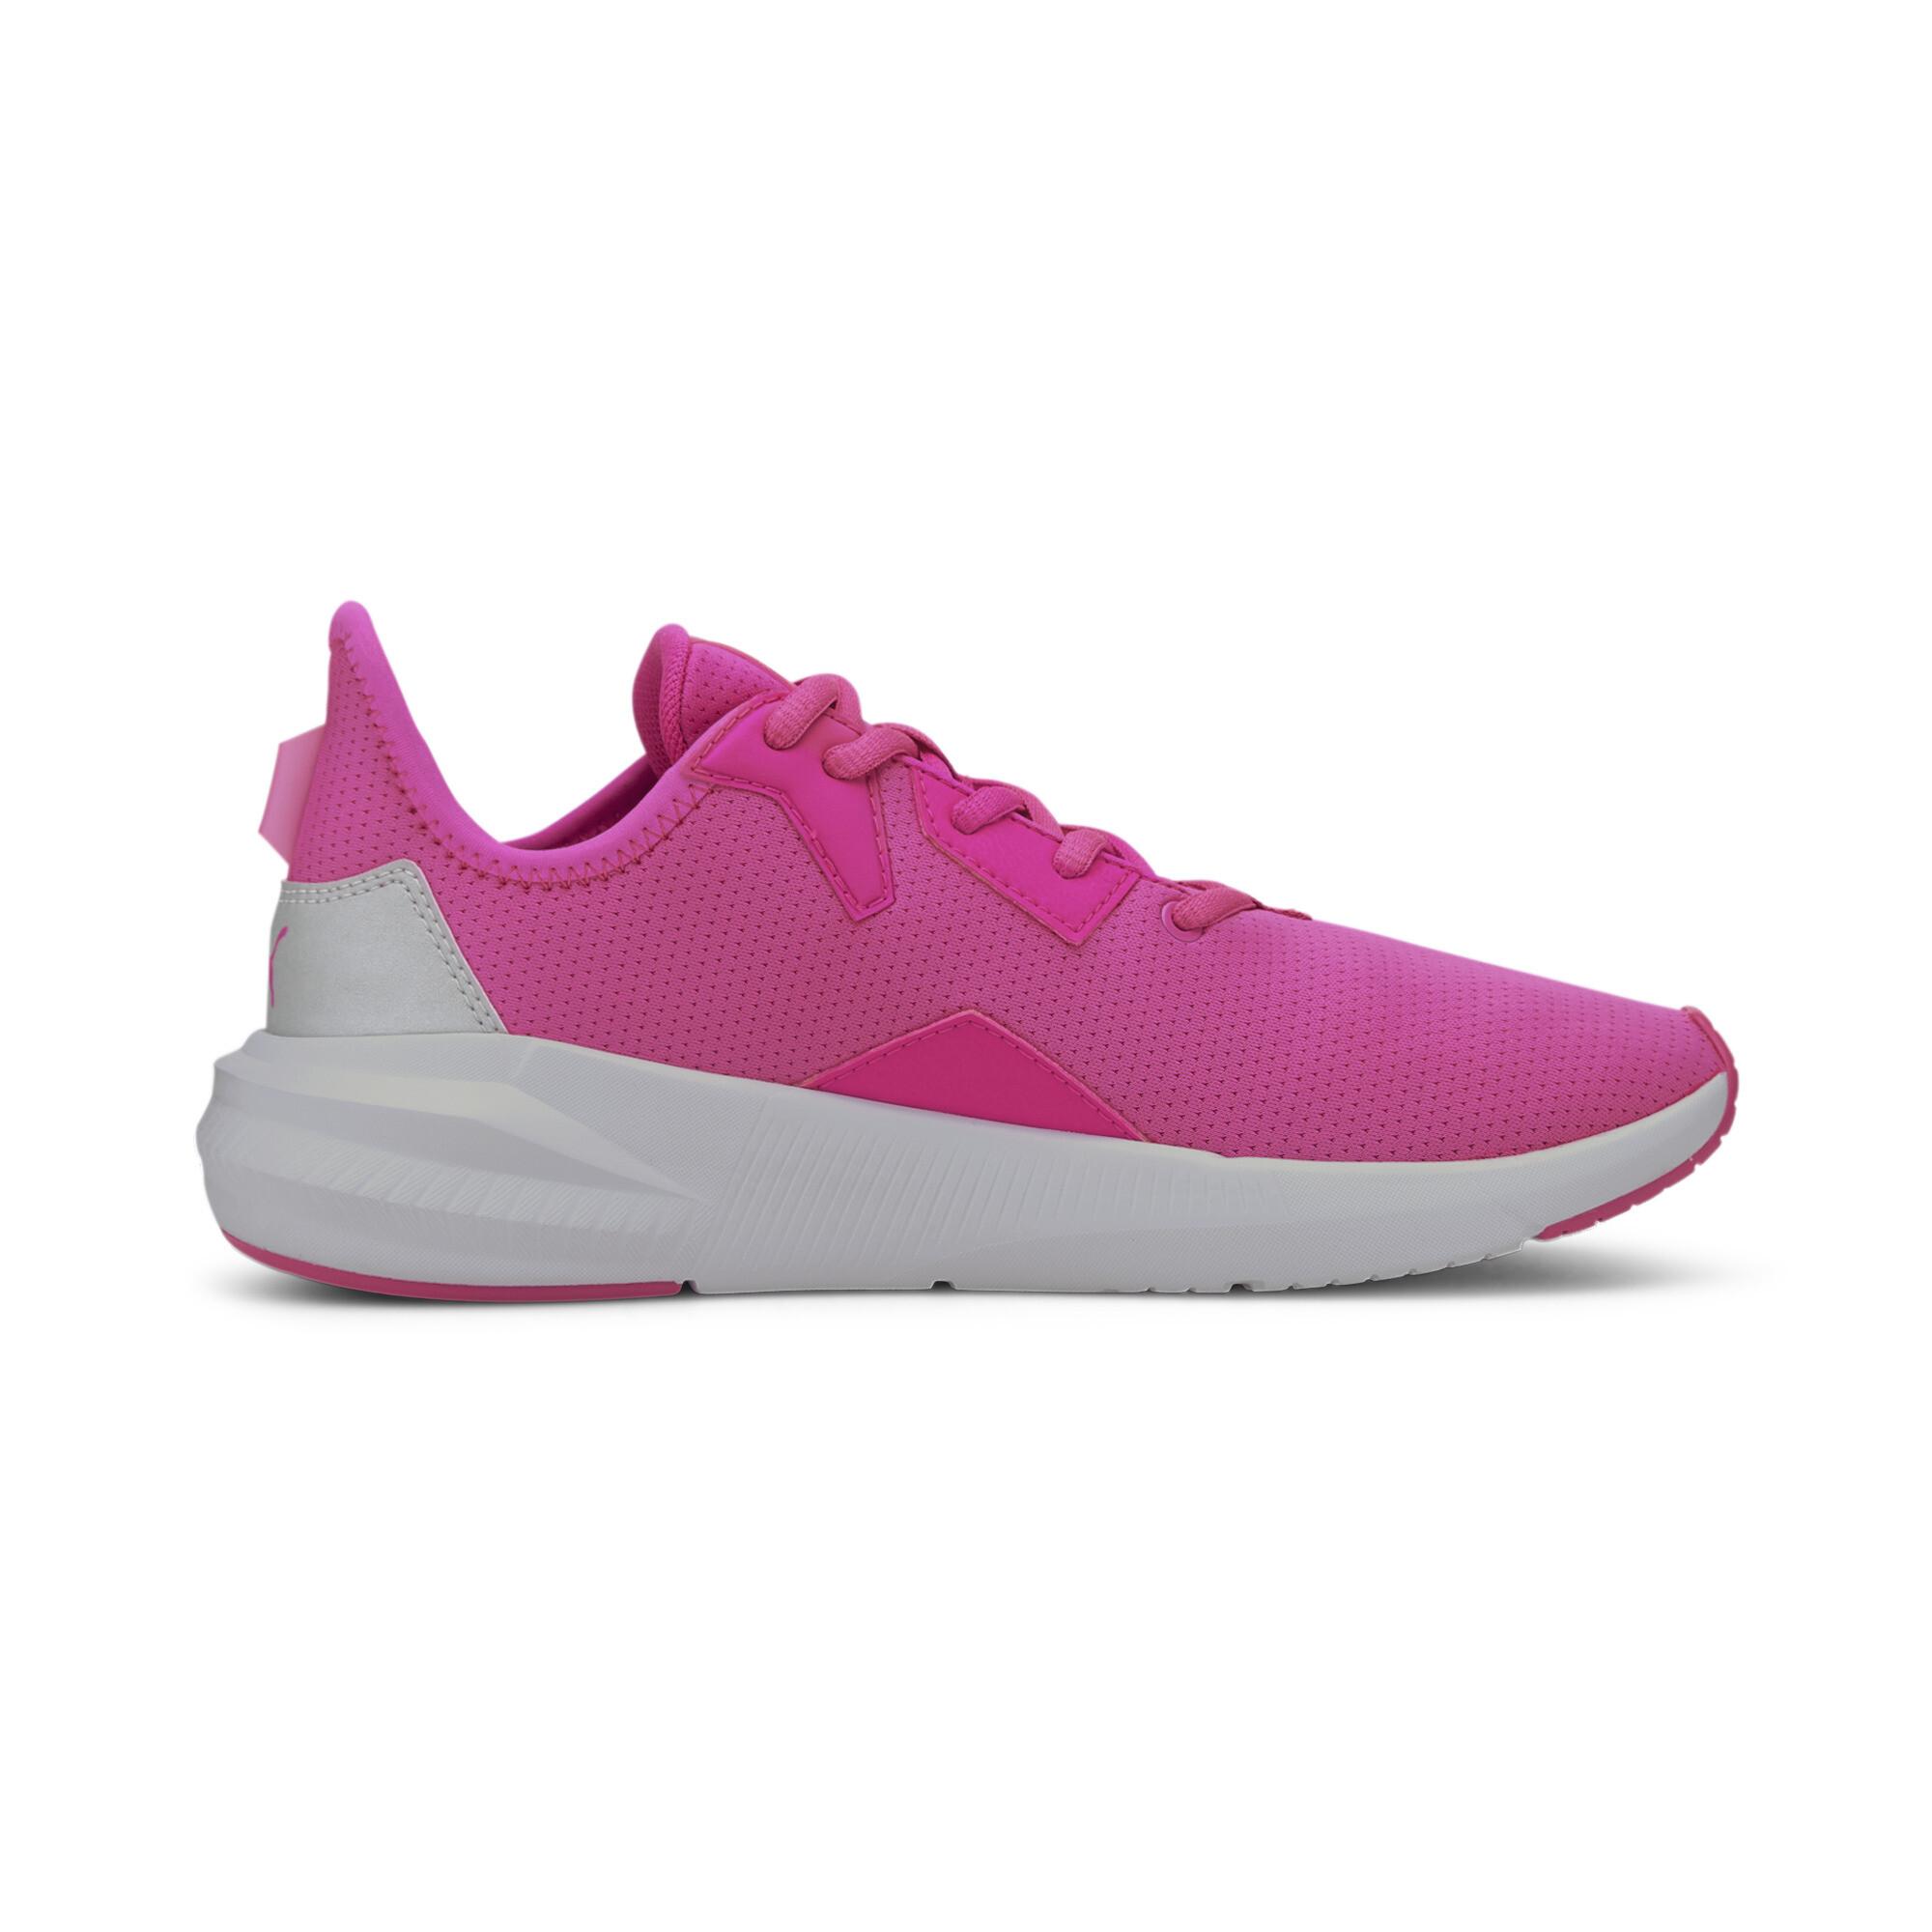 thumbnail 14 - PUMA-Women-039-s-Platinum-Training-Shoes